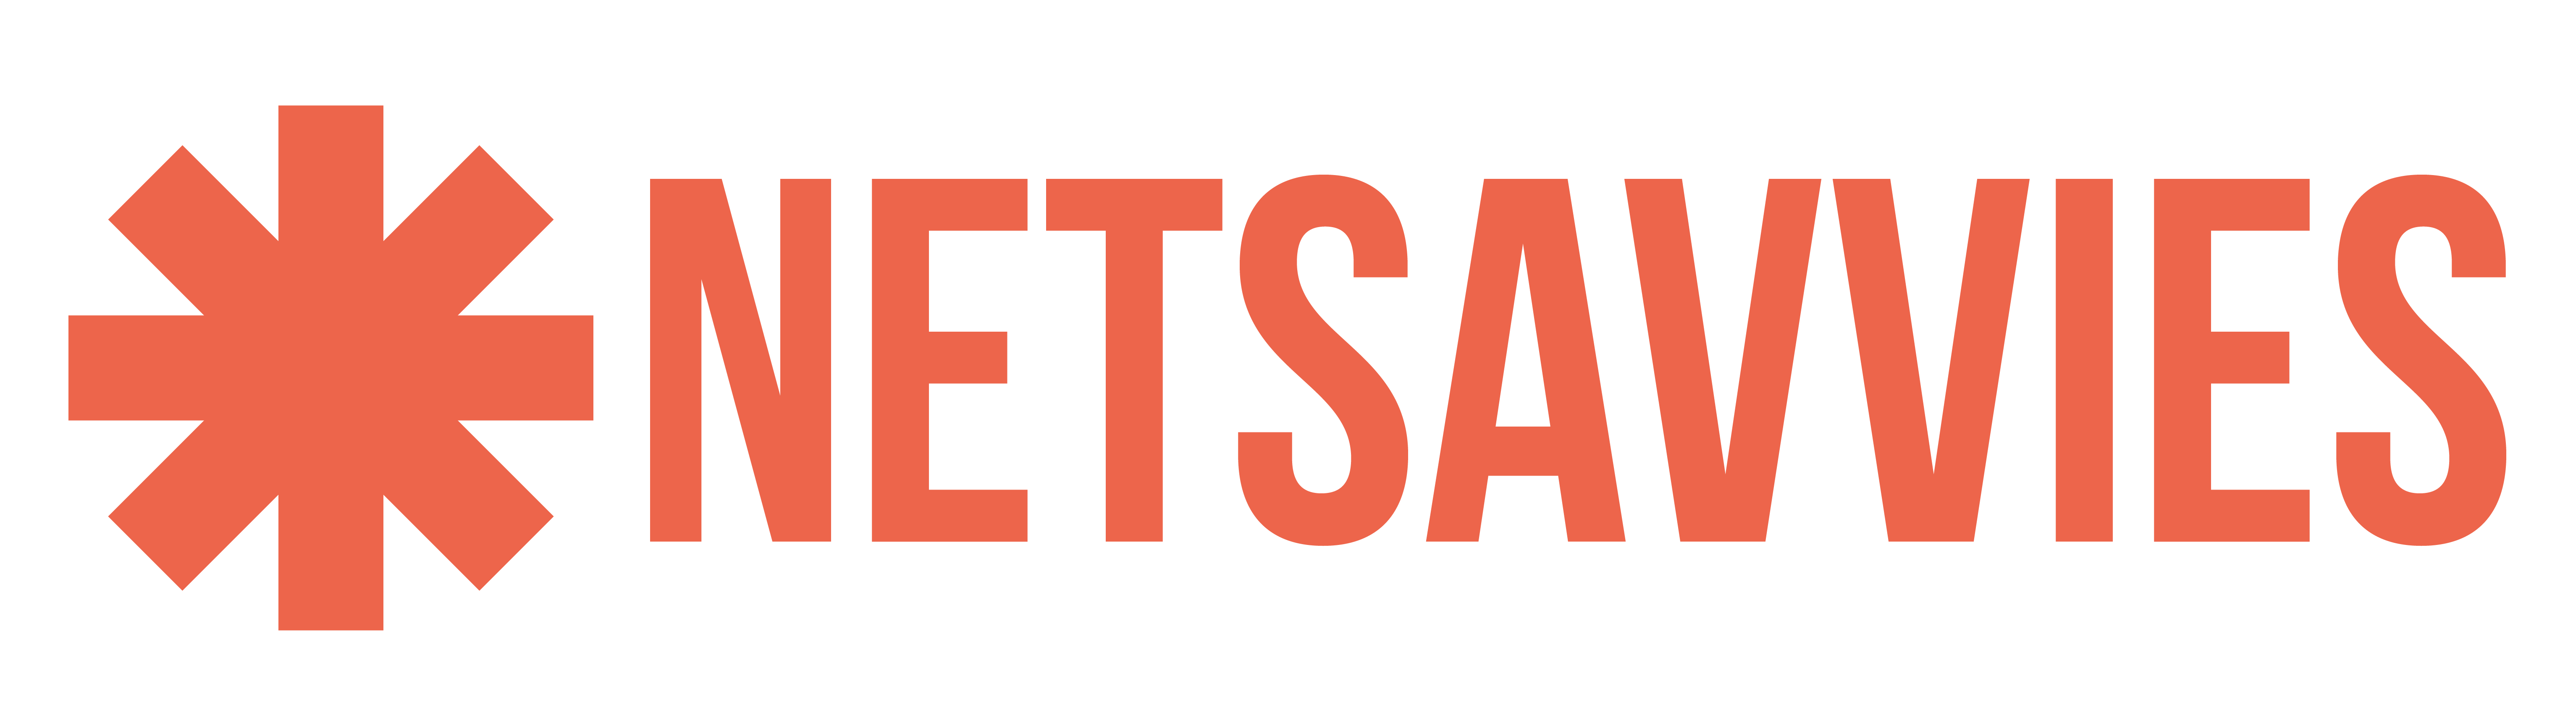 Netsavvies - Digital Marketing Agency in Ahmedabad